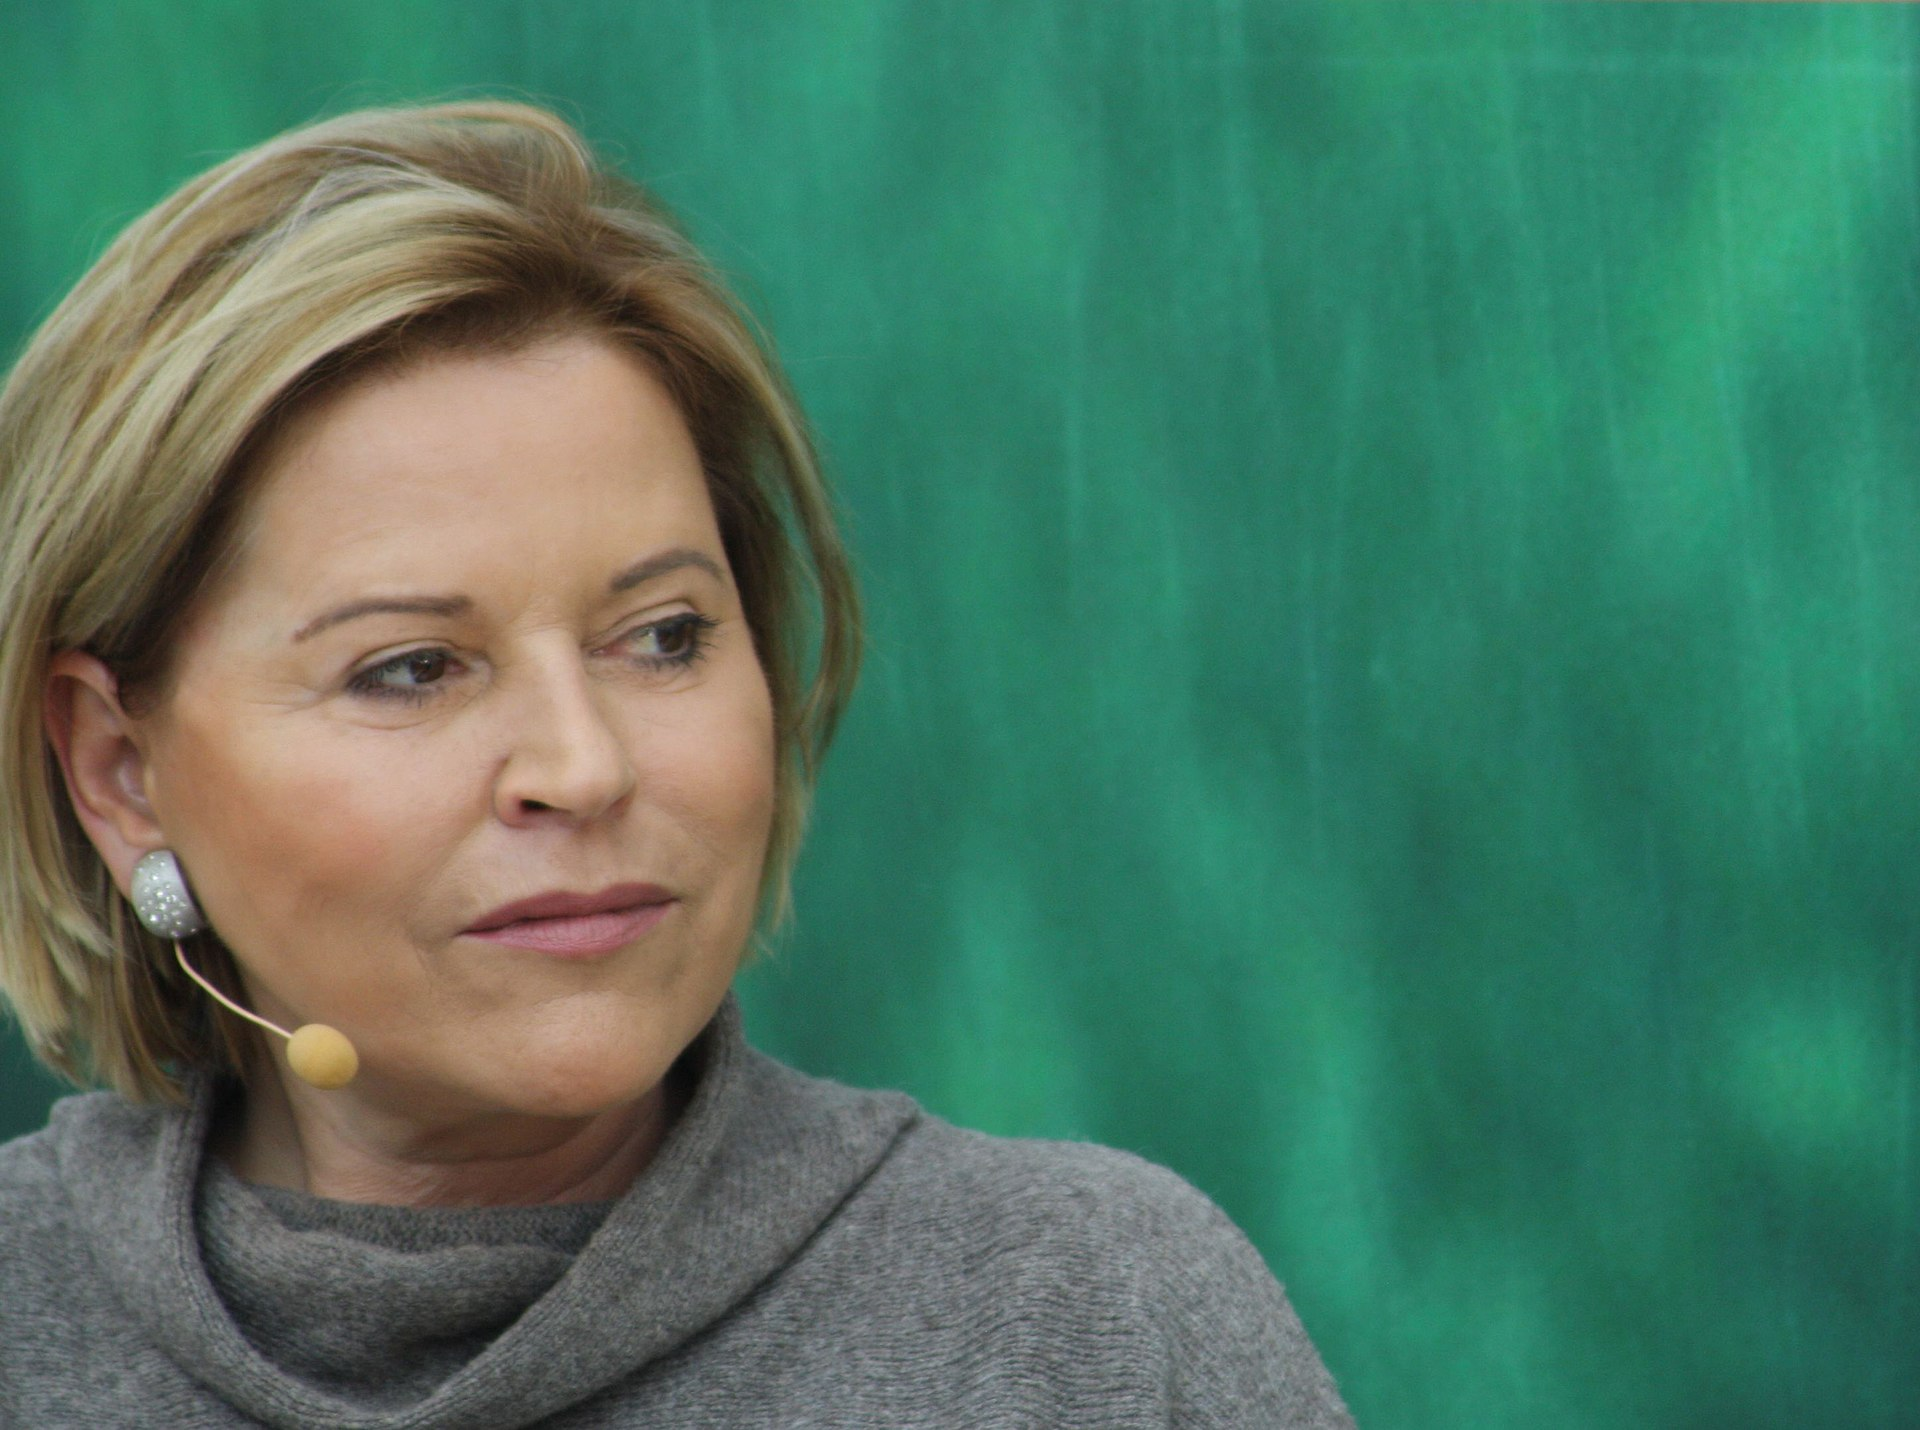 Elisabeth Herrmann Reihenfolge